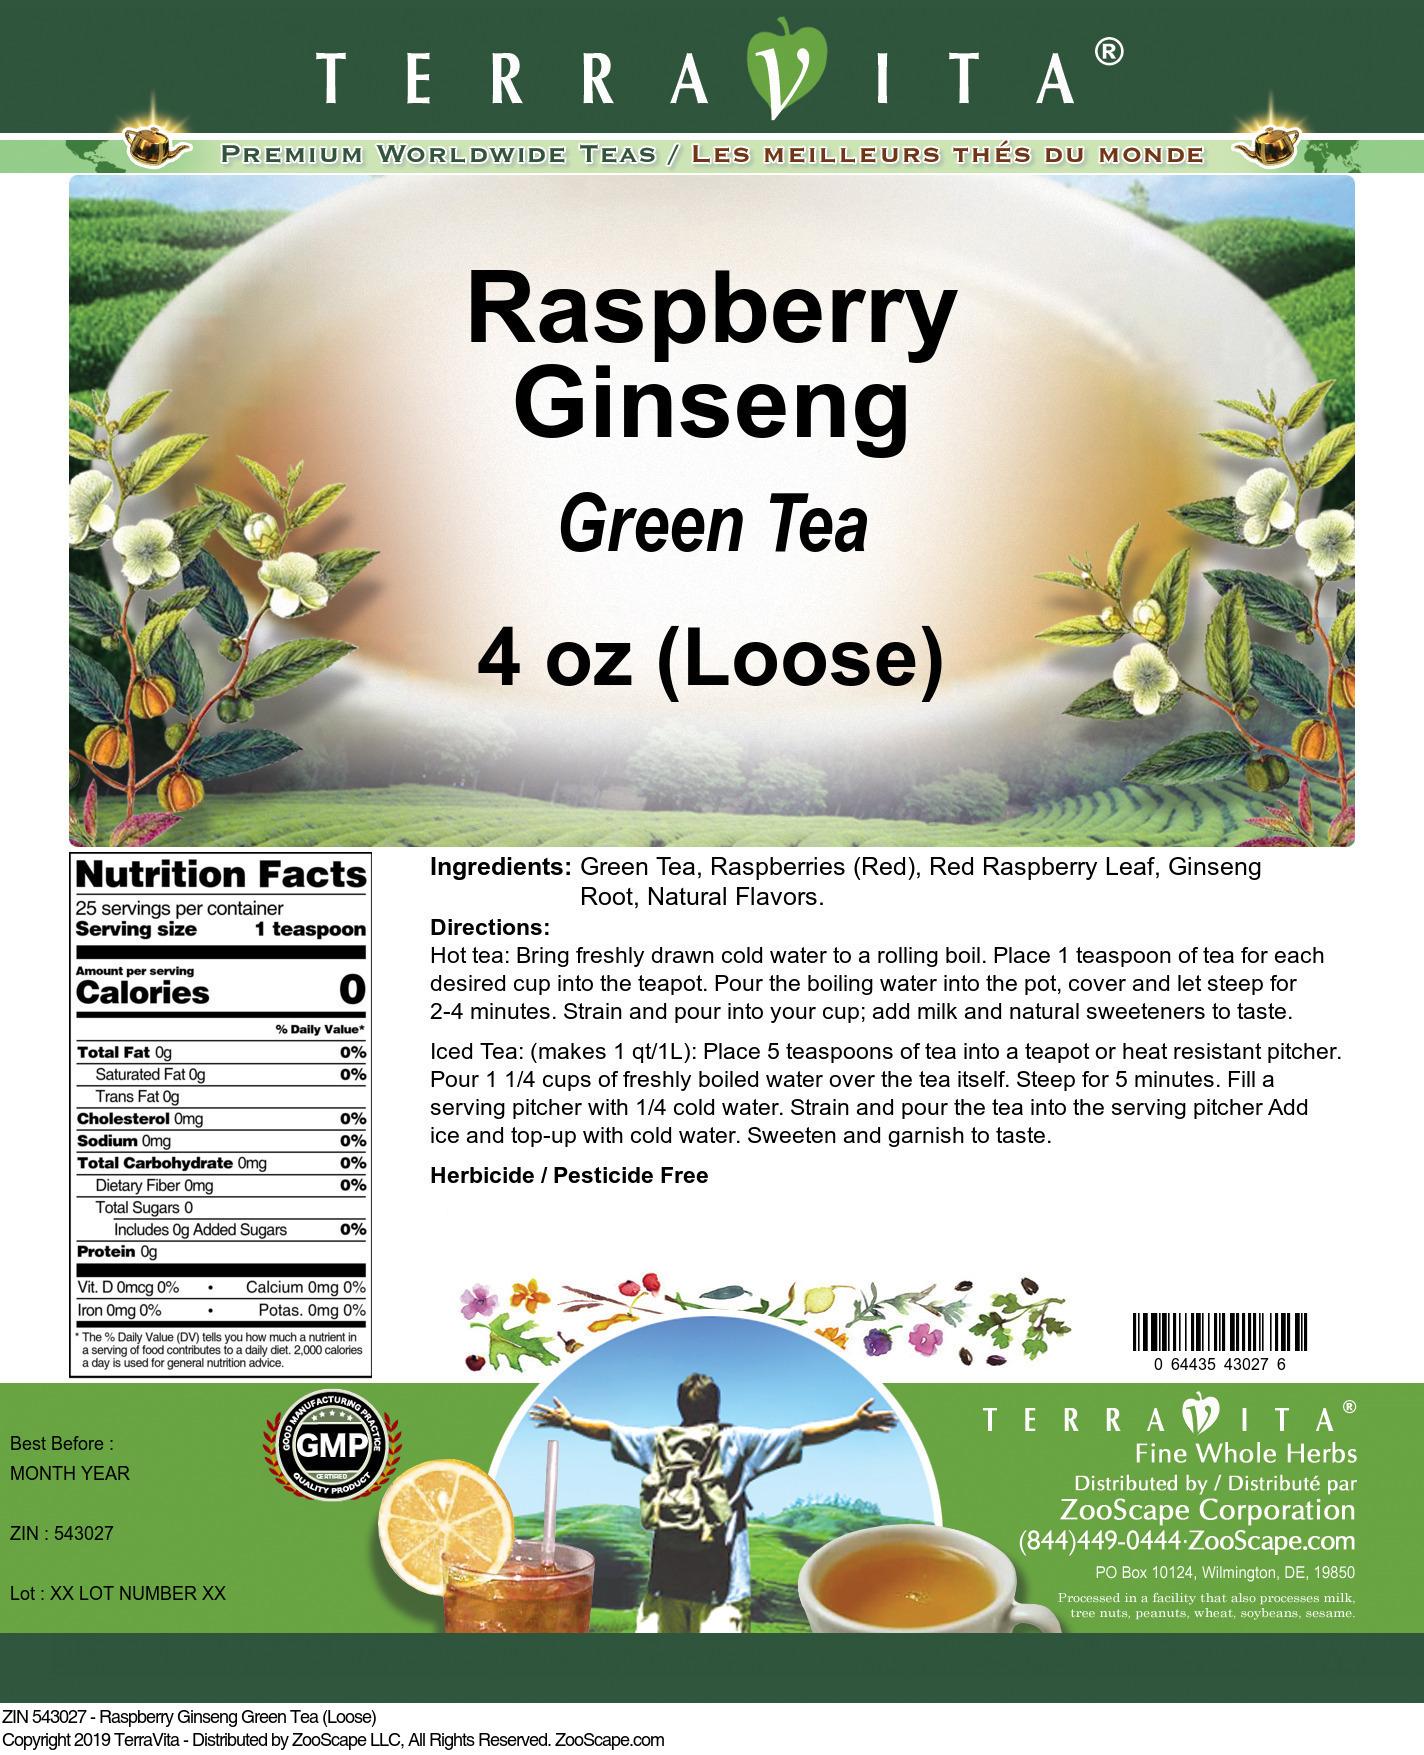 Raspberry Ginseng Green Tea (Loose)